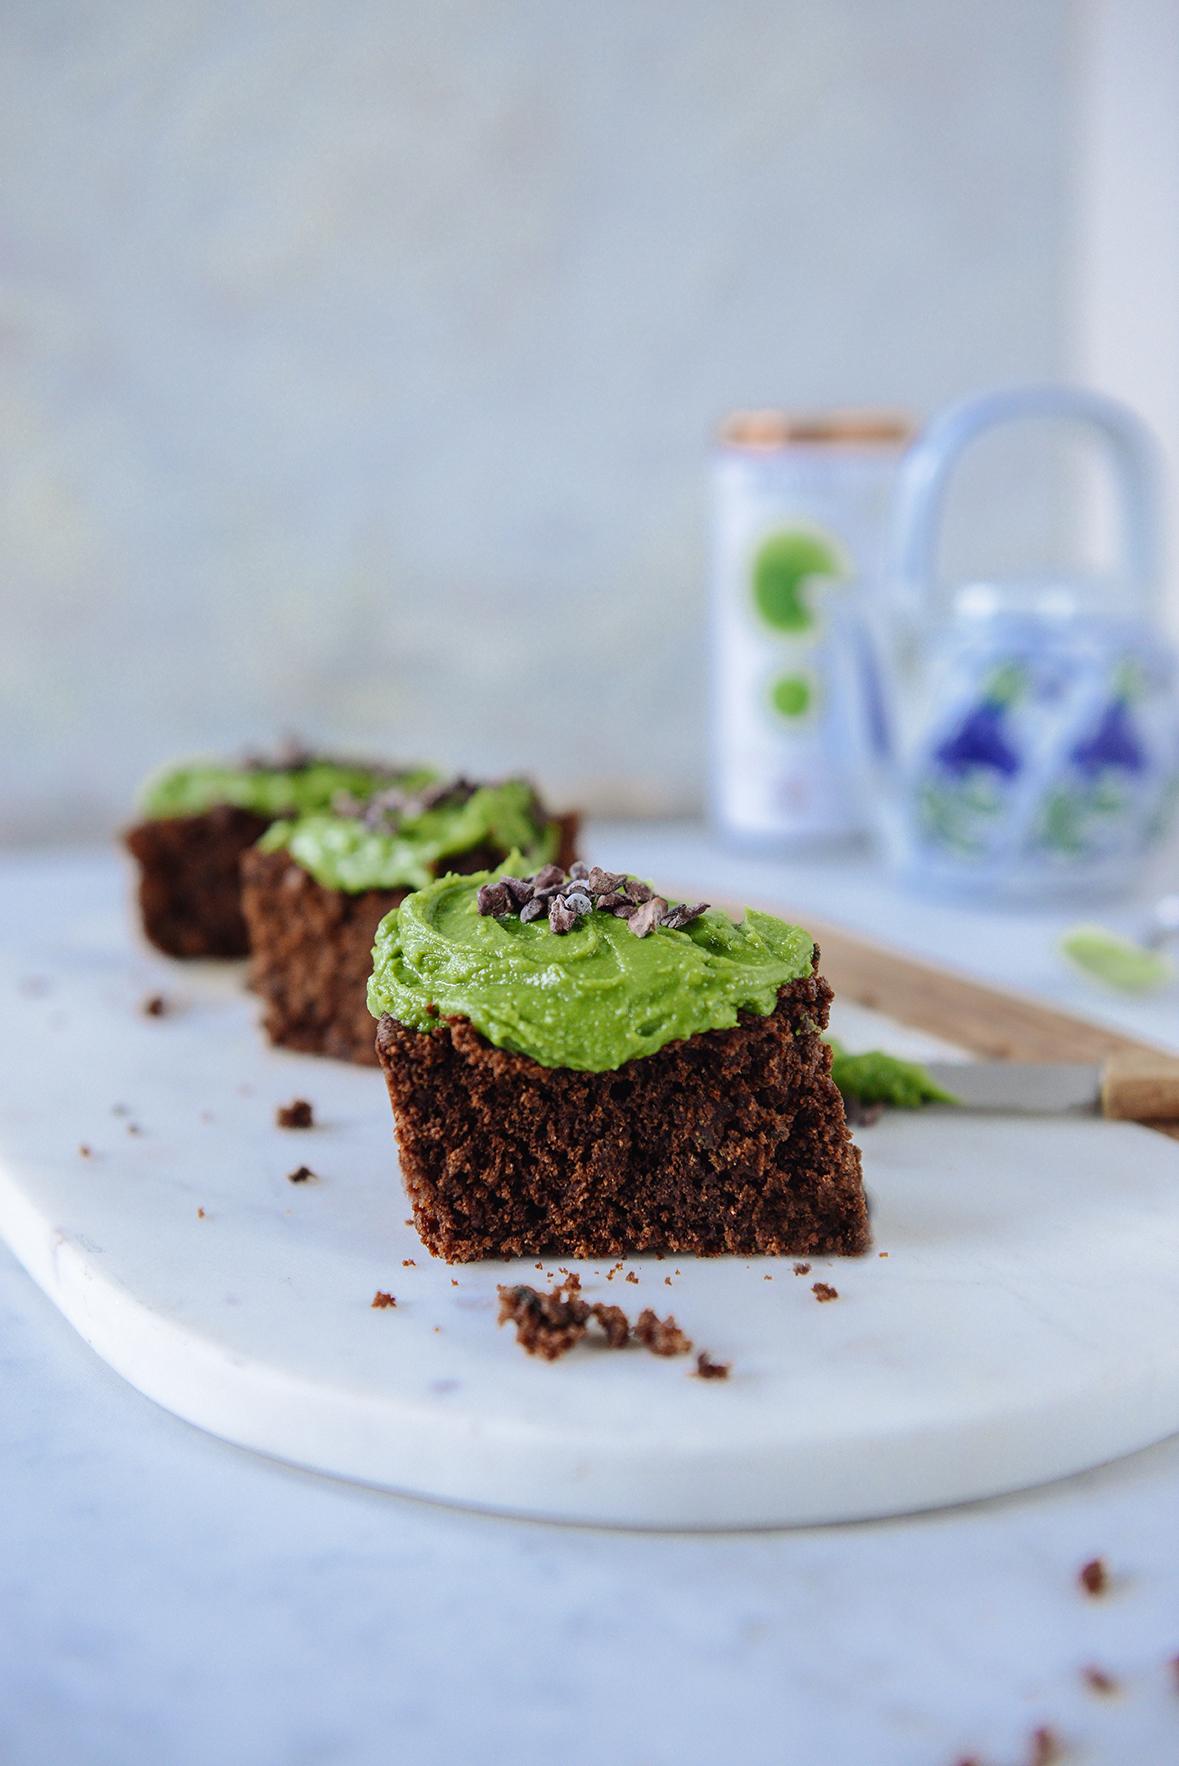 Chocolate Zucchini Cake with Matcha Frosting {Gluten Free} // www.WithTheGrains.com